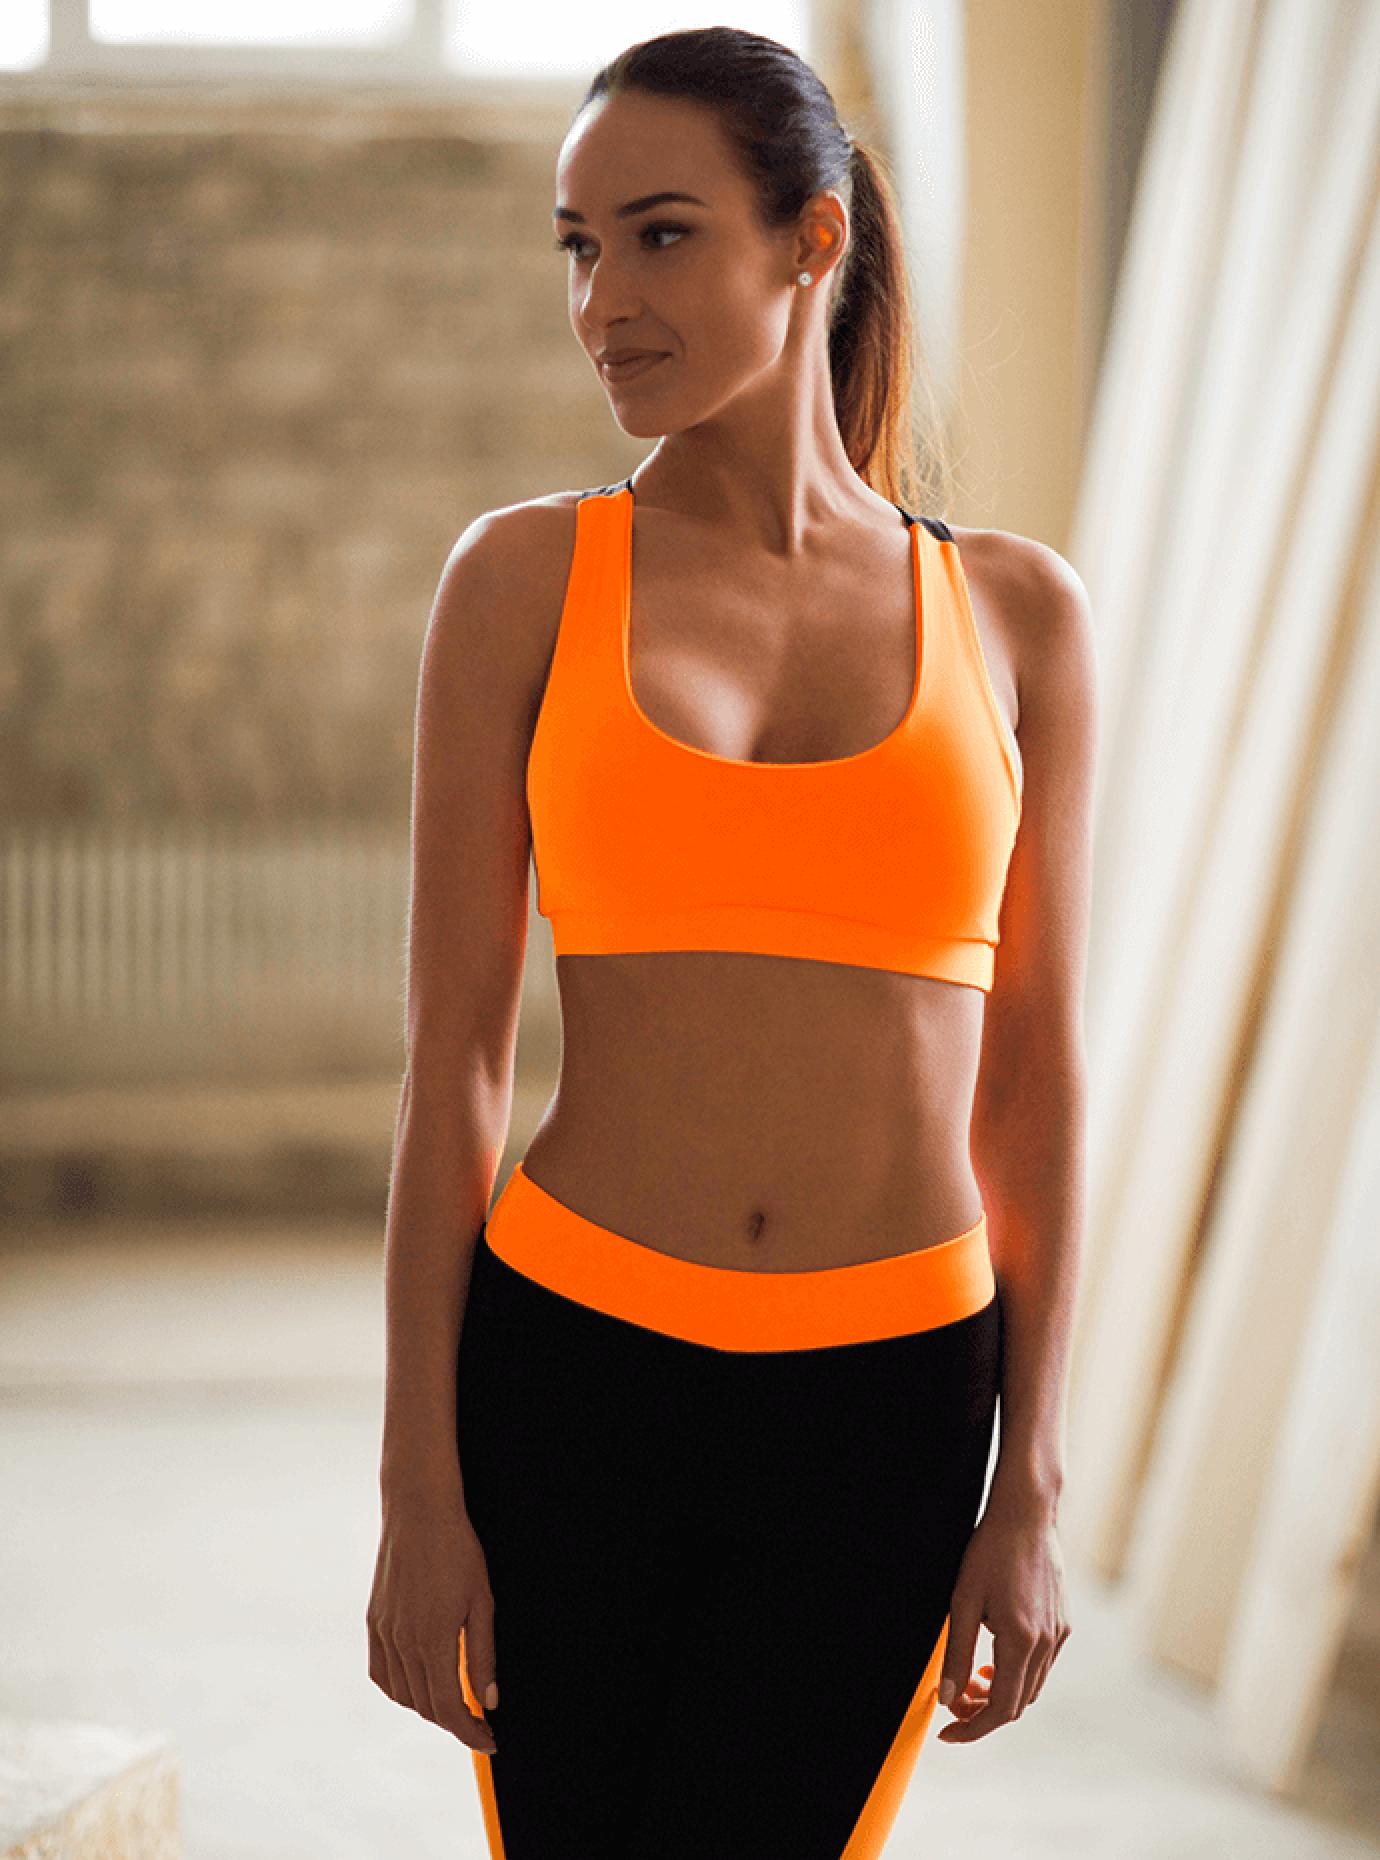 Топ женский Basic Orange Серый S (01-F171158): фото - Alster.ua